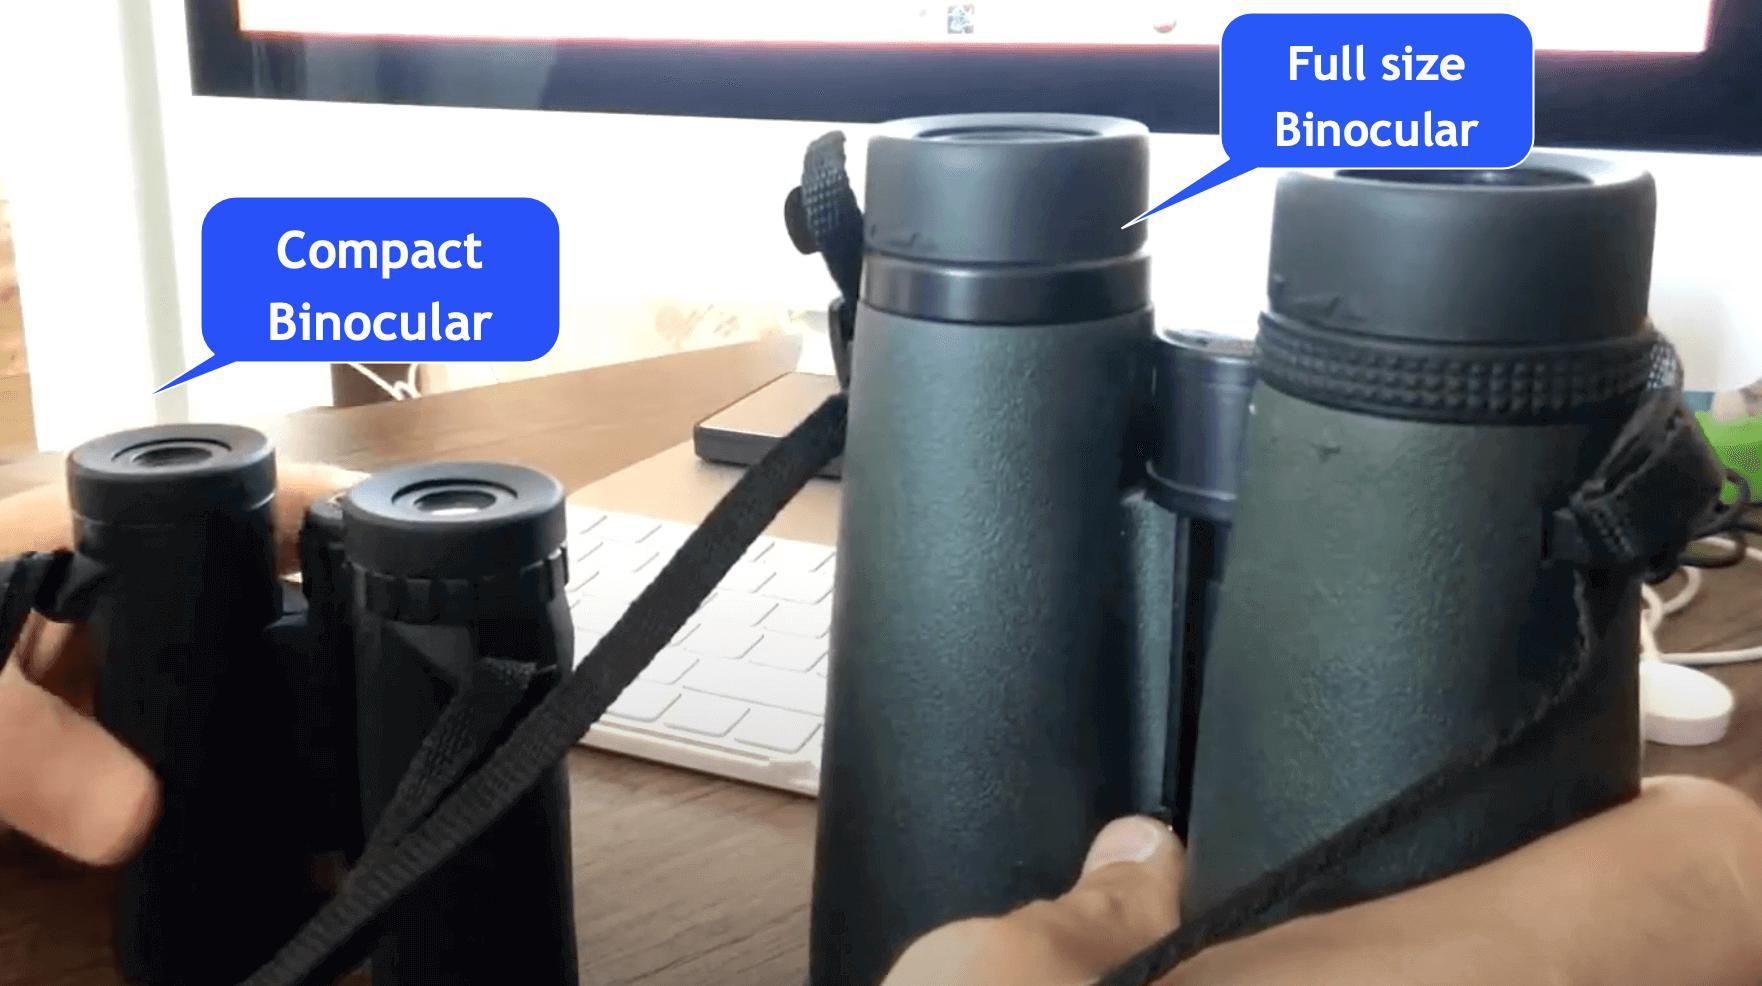 compact and full size binoculars